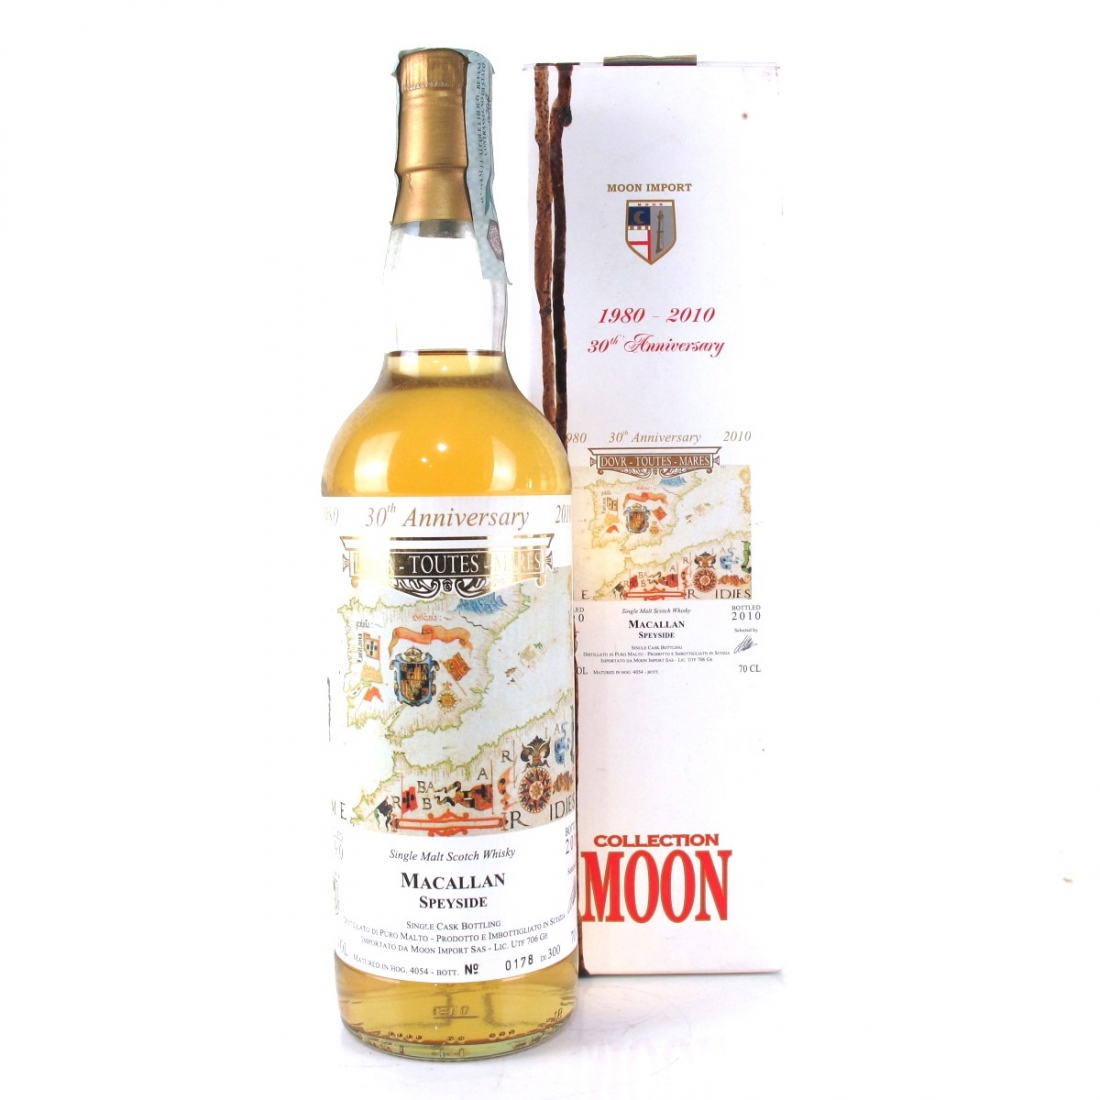 Macallan 1990 Moon Import 30th Anniversary